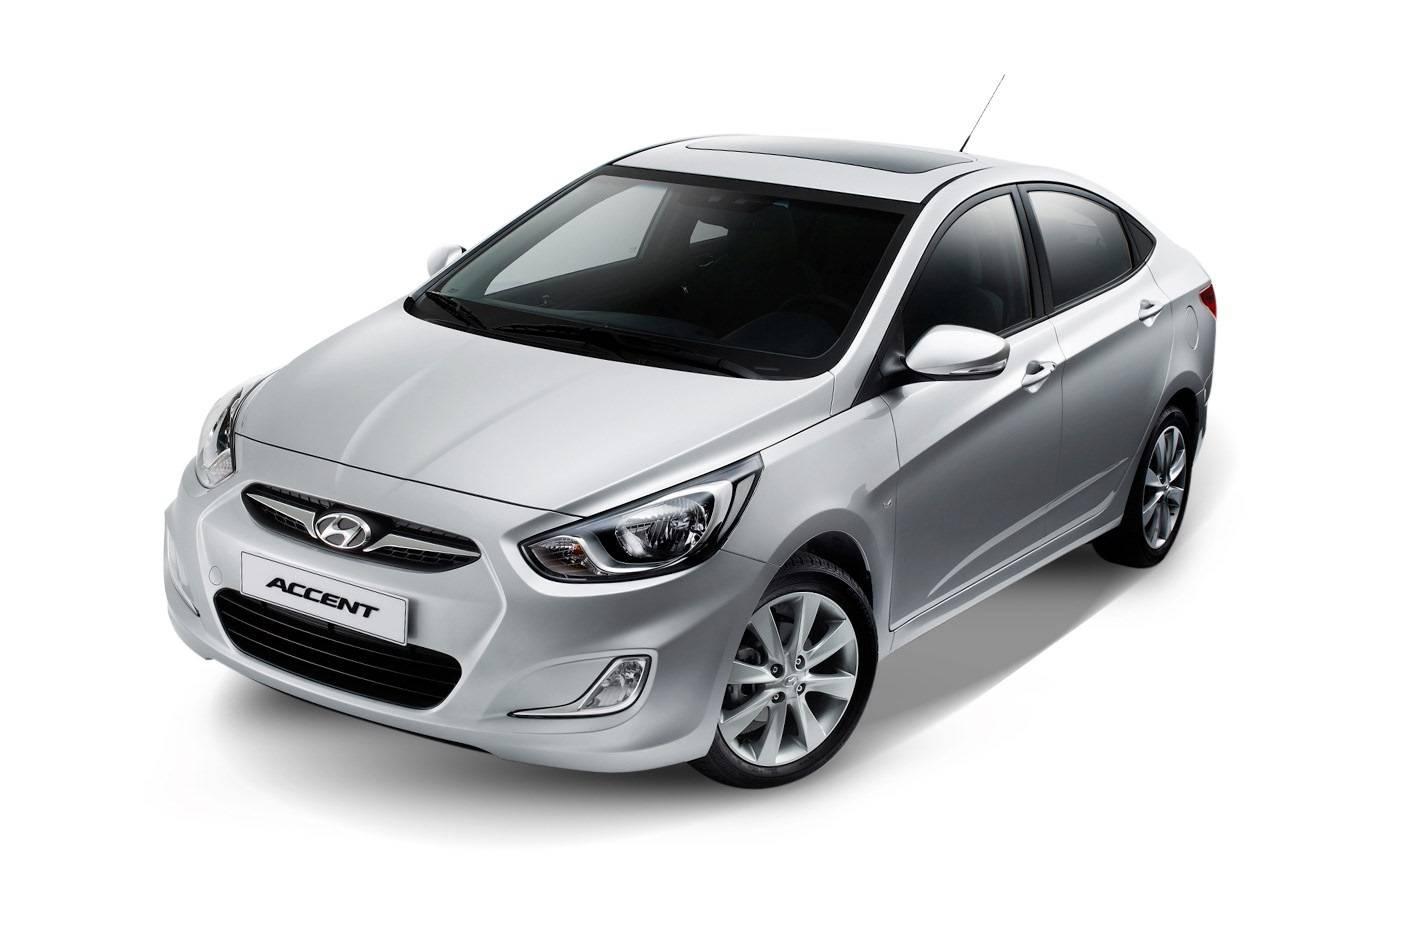 Что взять за 200: Hyundai Accent II или Kia Rio I